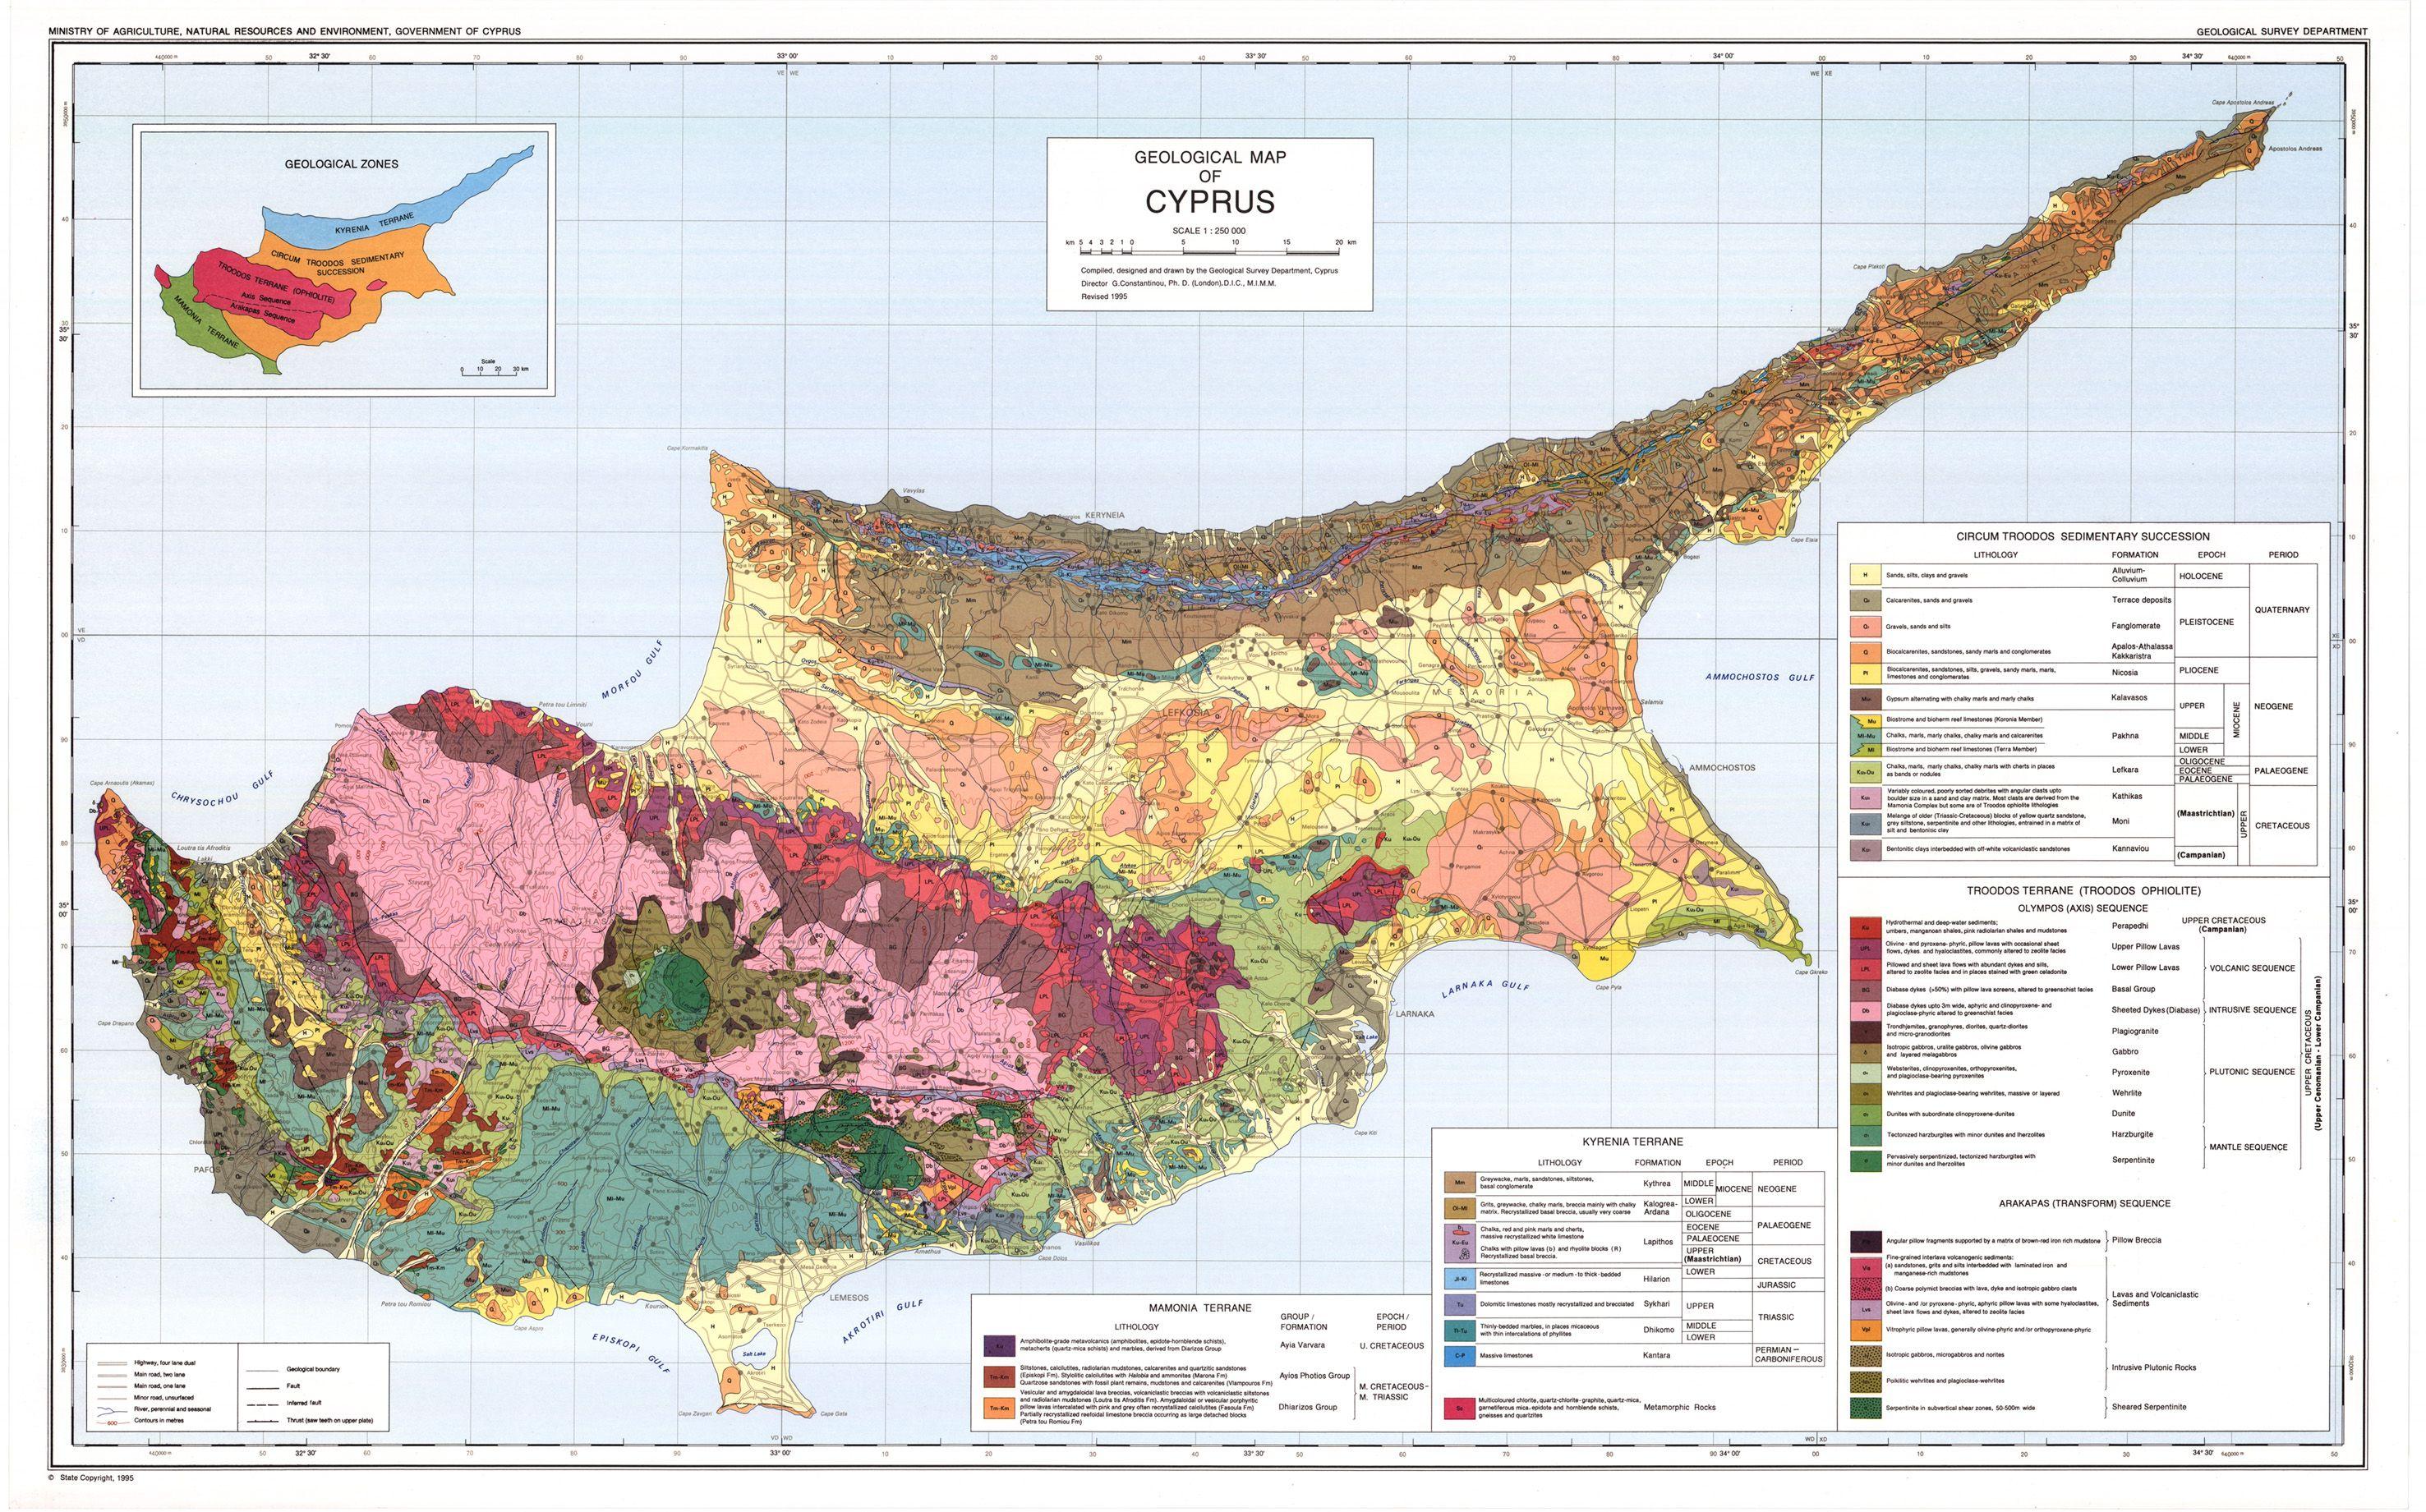 Geologicalmapofcyprus